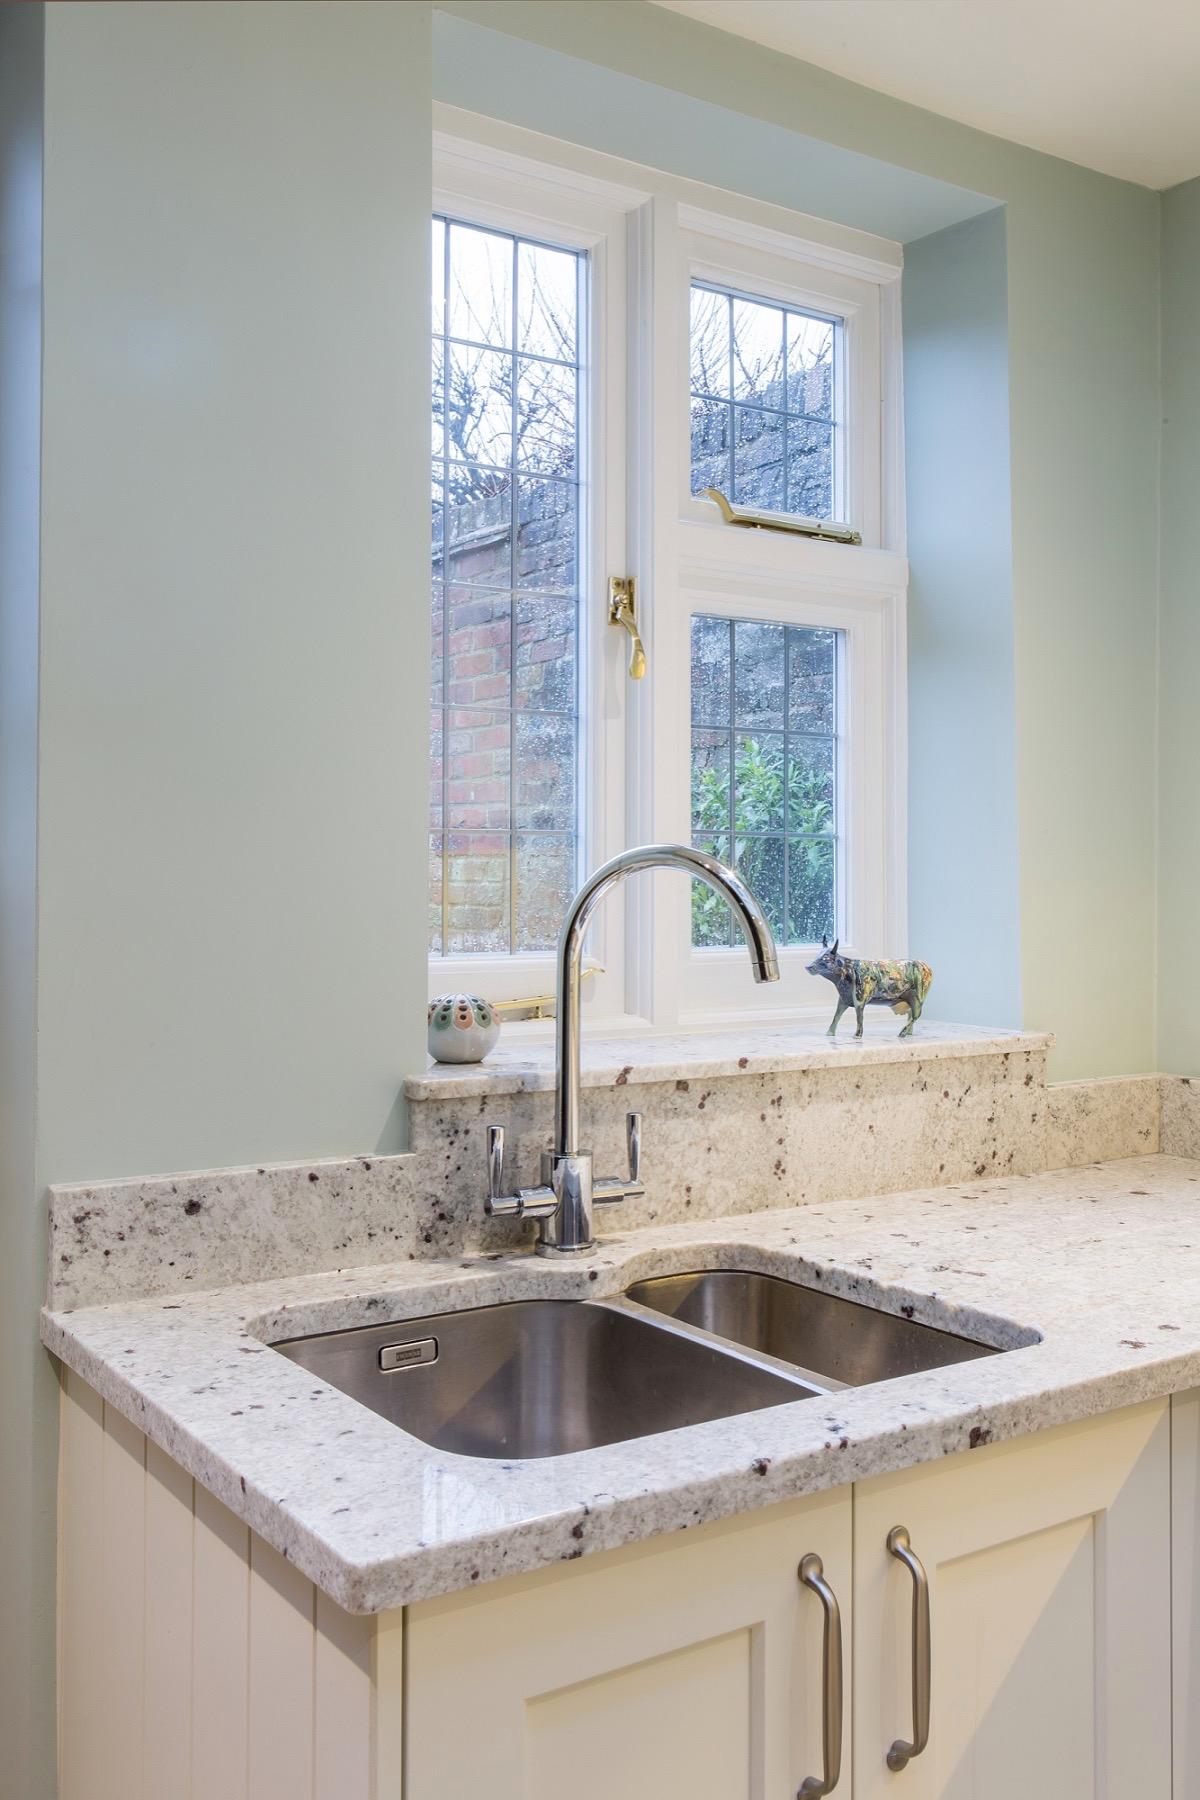 granite upstand with riser to windowsill in granite princes risborough longwick buckinghamshire kitchen